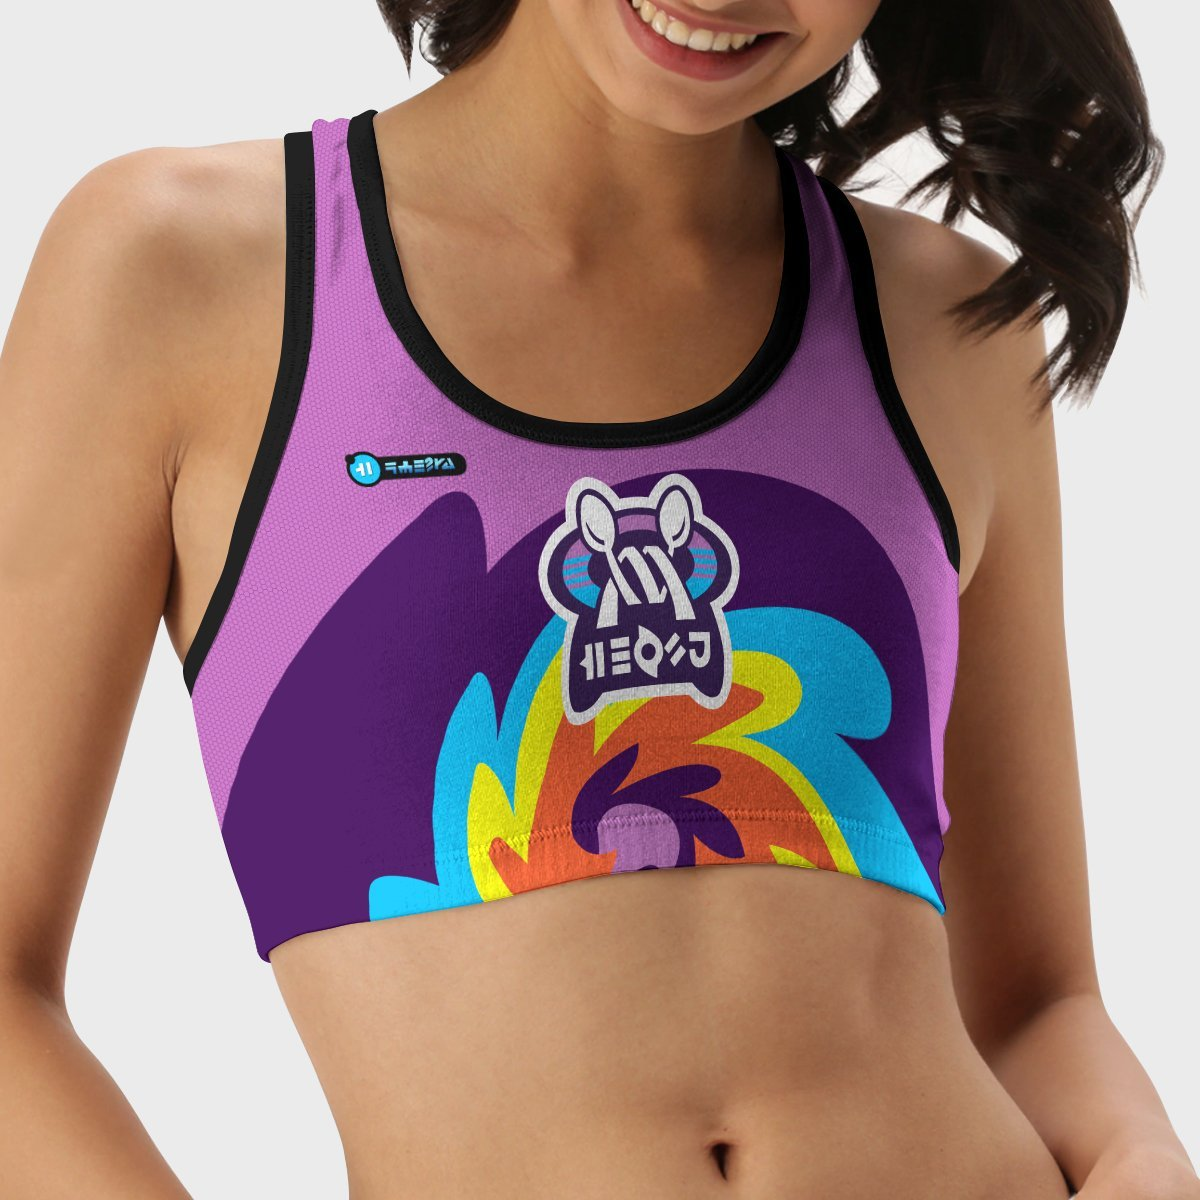 pokemon psychic uniform active wear set 629809 - Anime Swimsuits